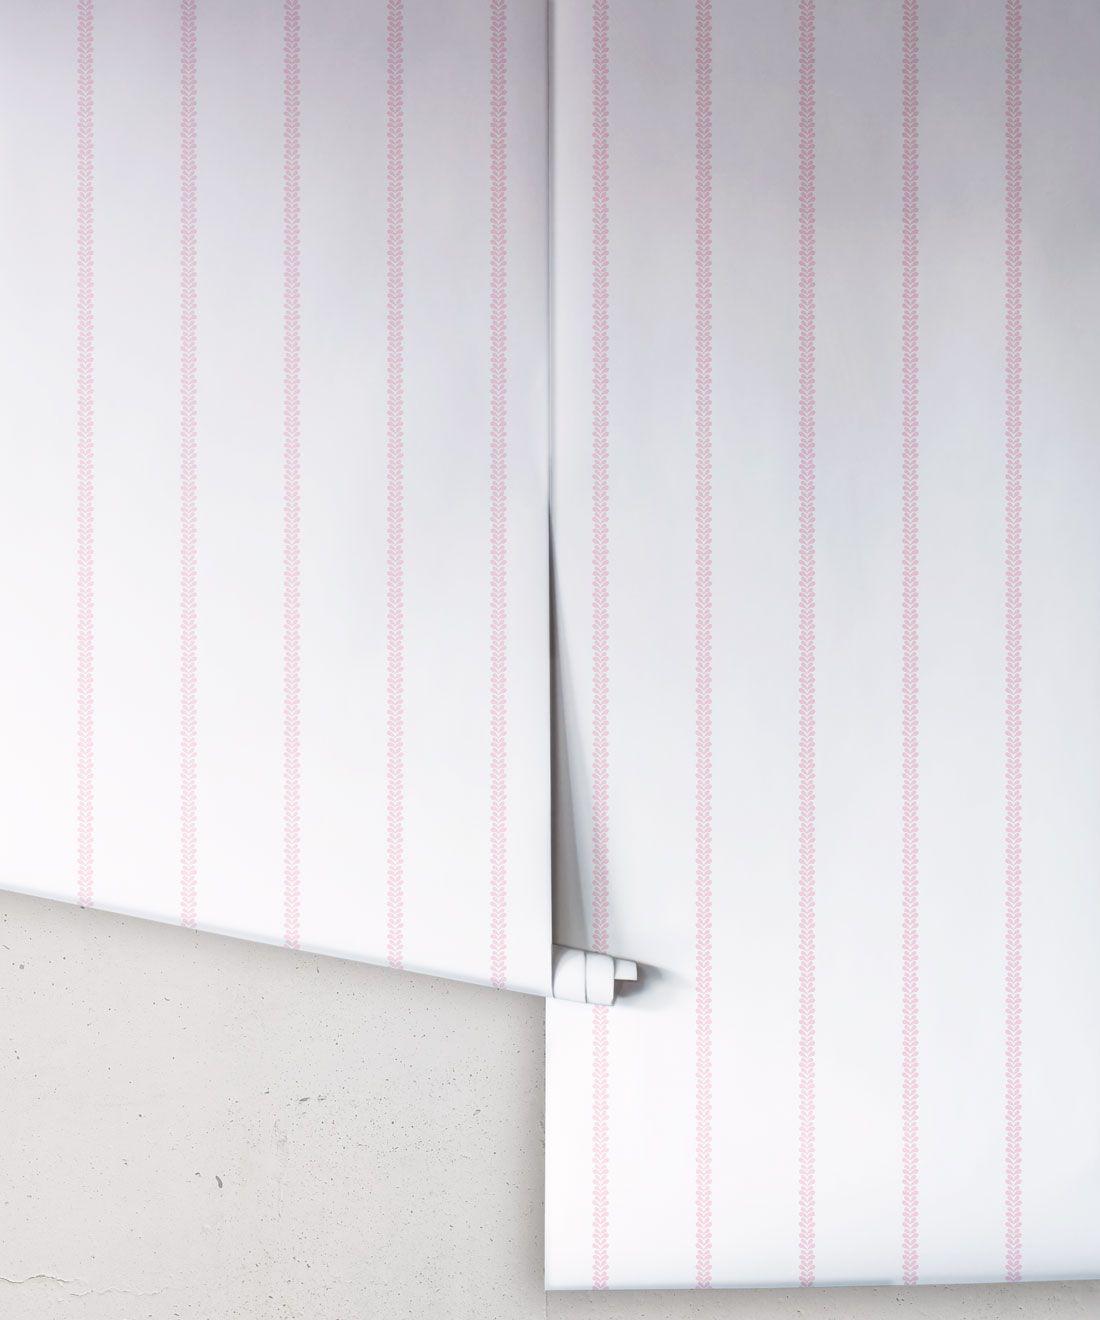 Chemin Wallpaper • Striped Wallpaper • Blush • Rolls